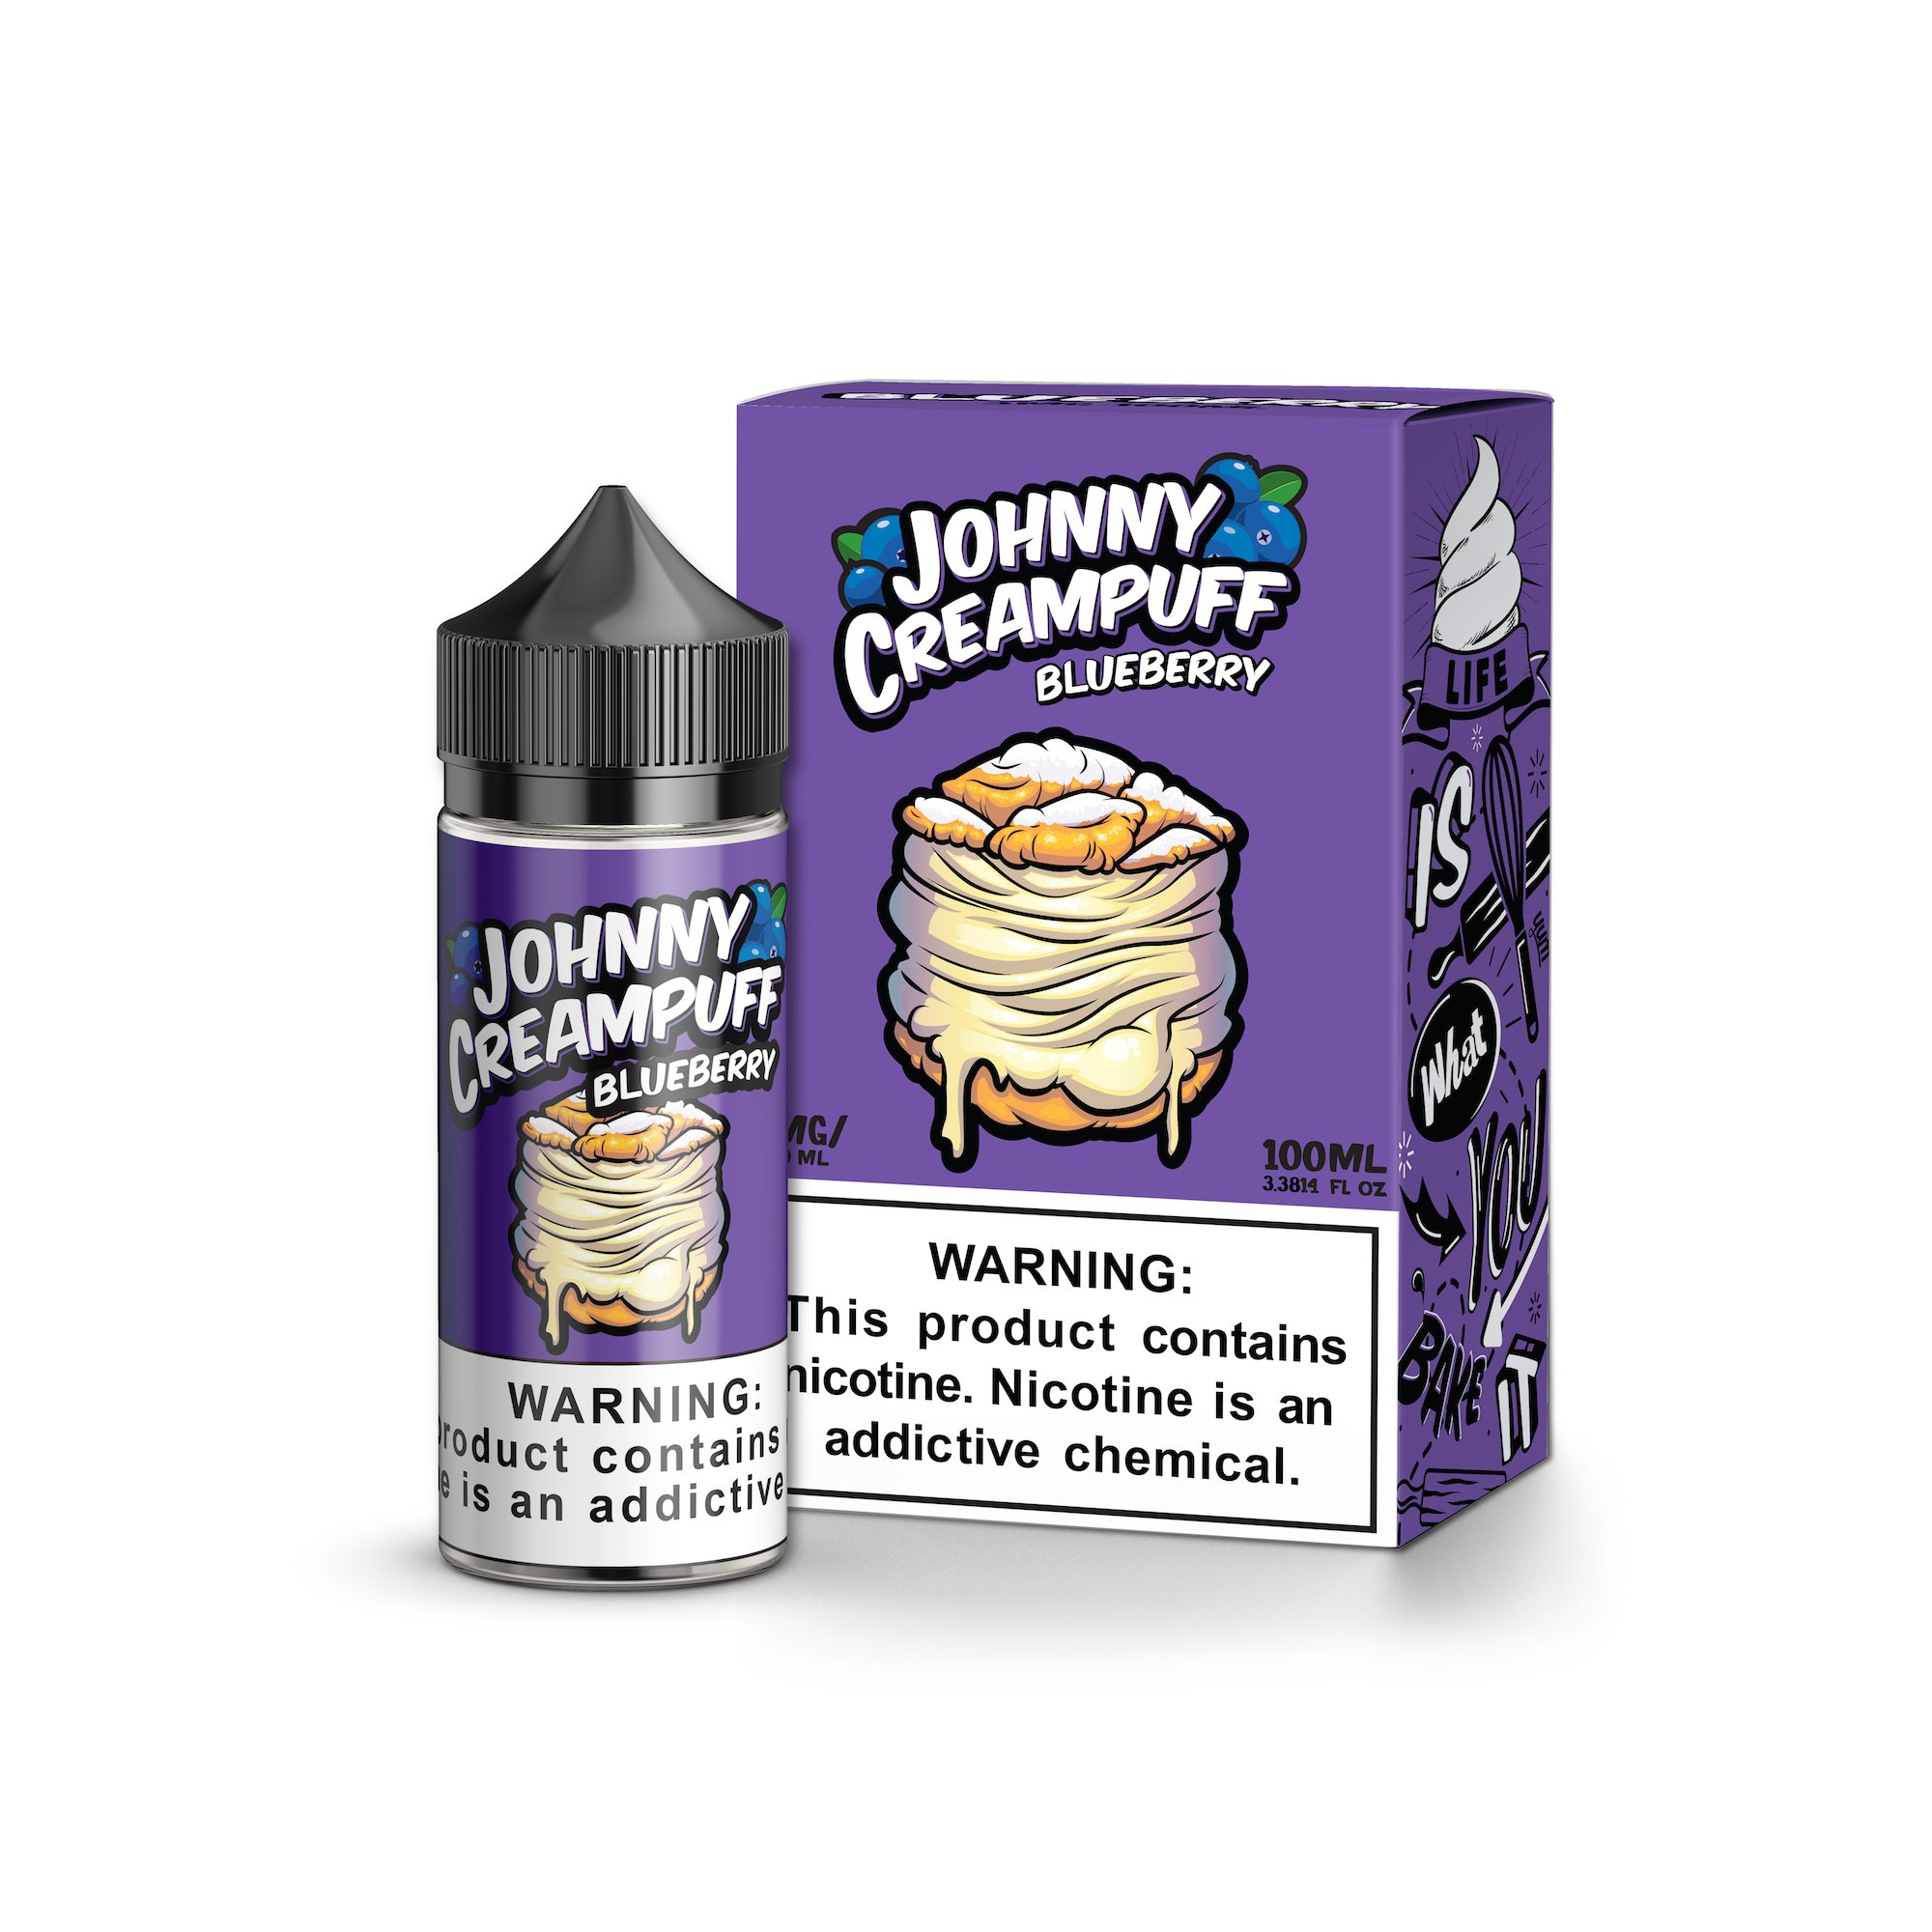 johnny-creampuff-21622441835